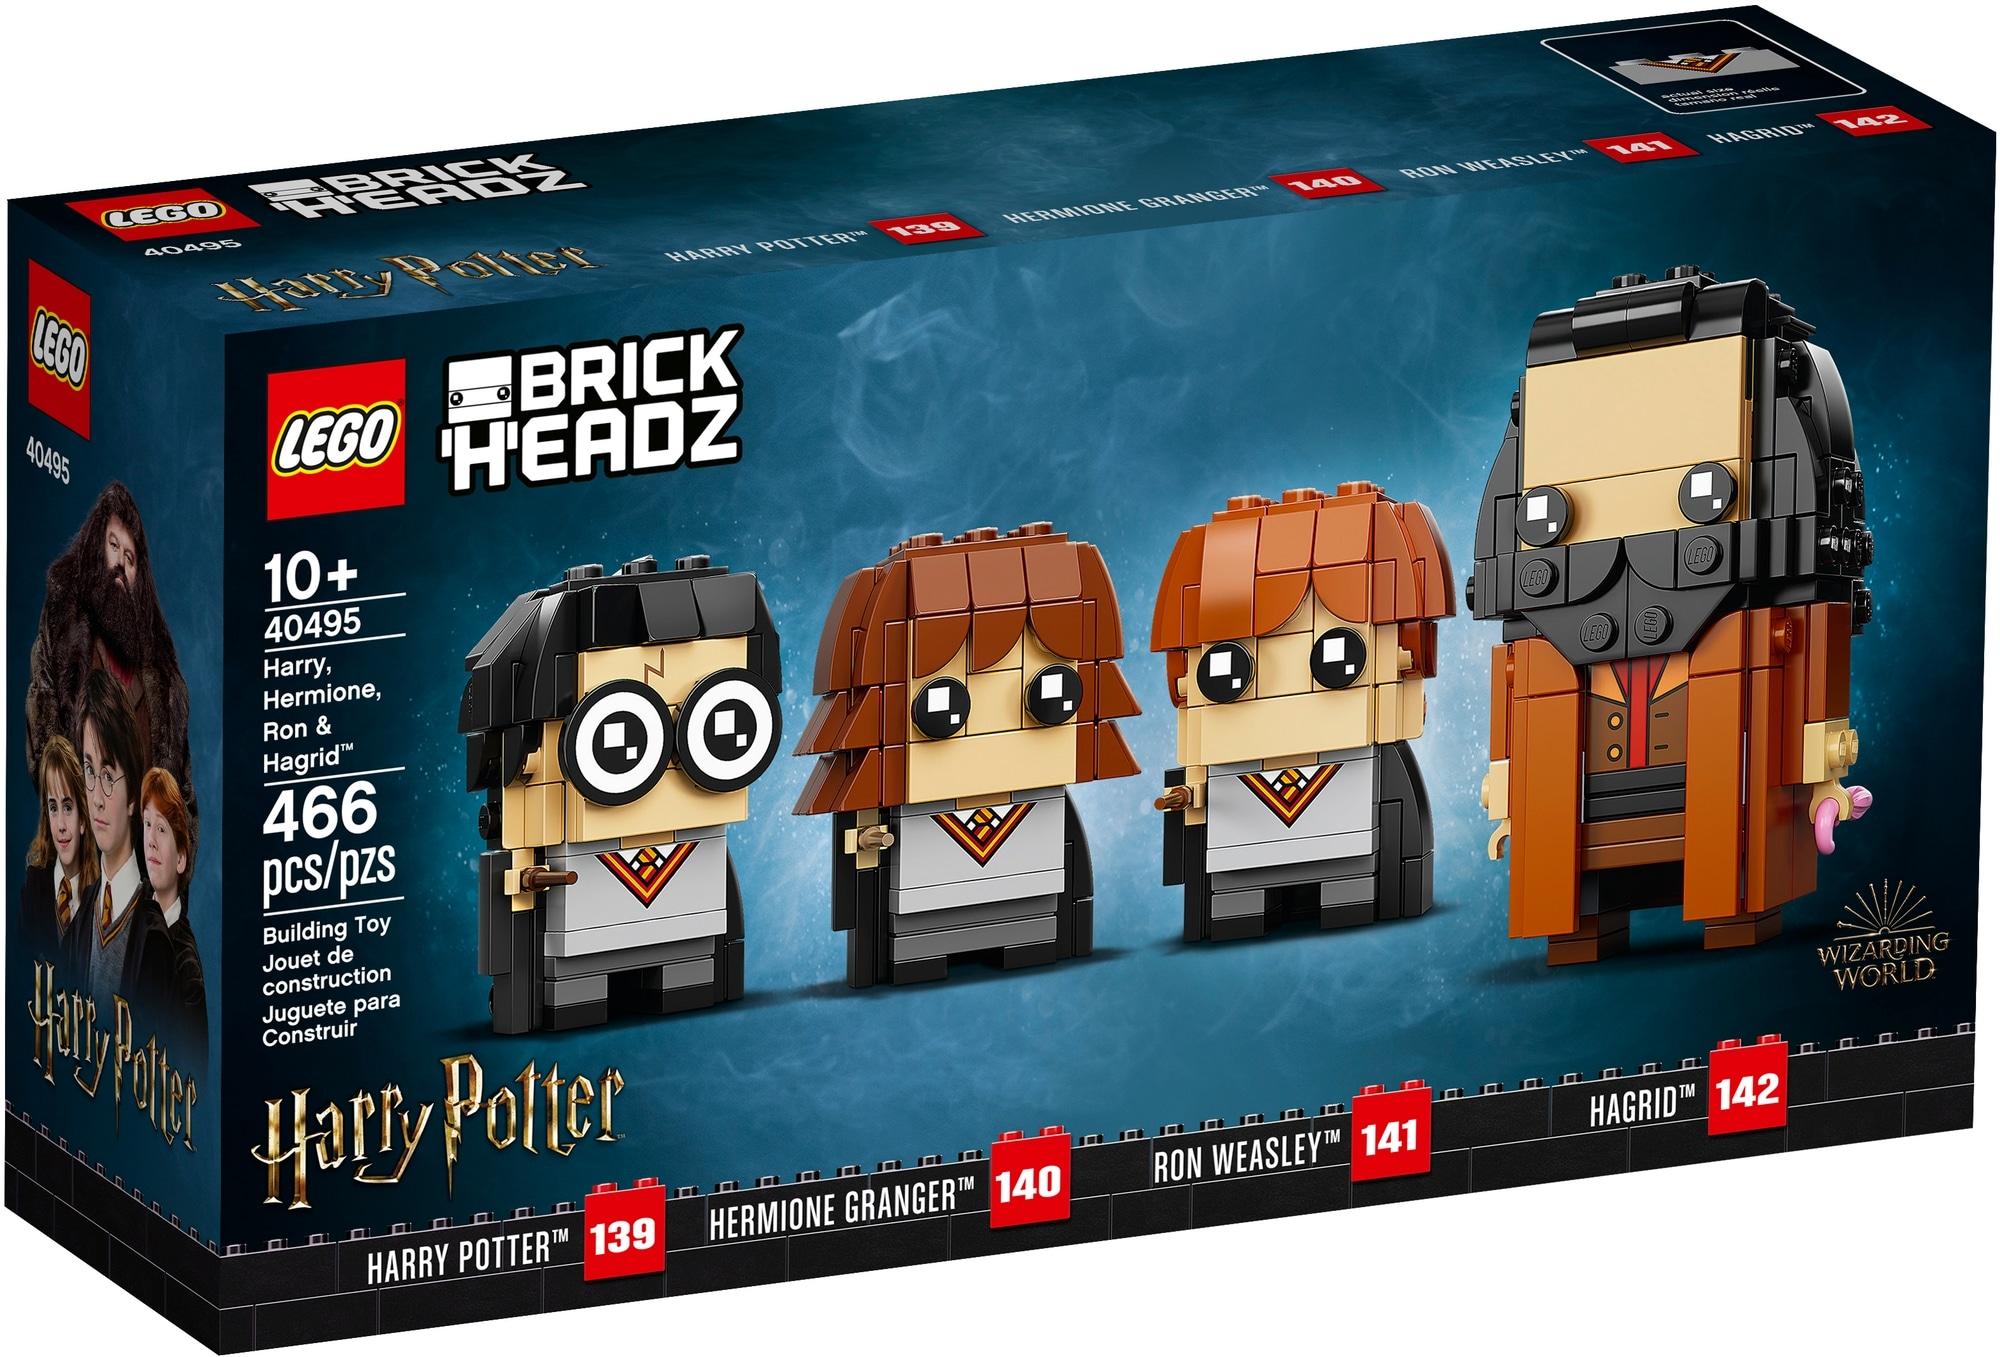 LEGO Brickheadz 40495 Harry, Hermine, Ron & Hagrid 2